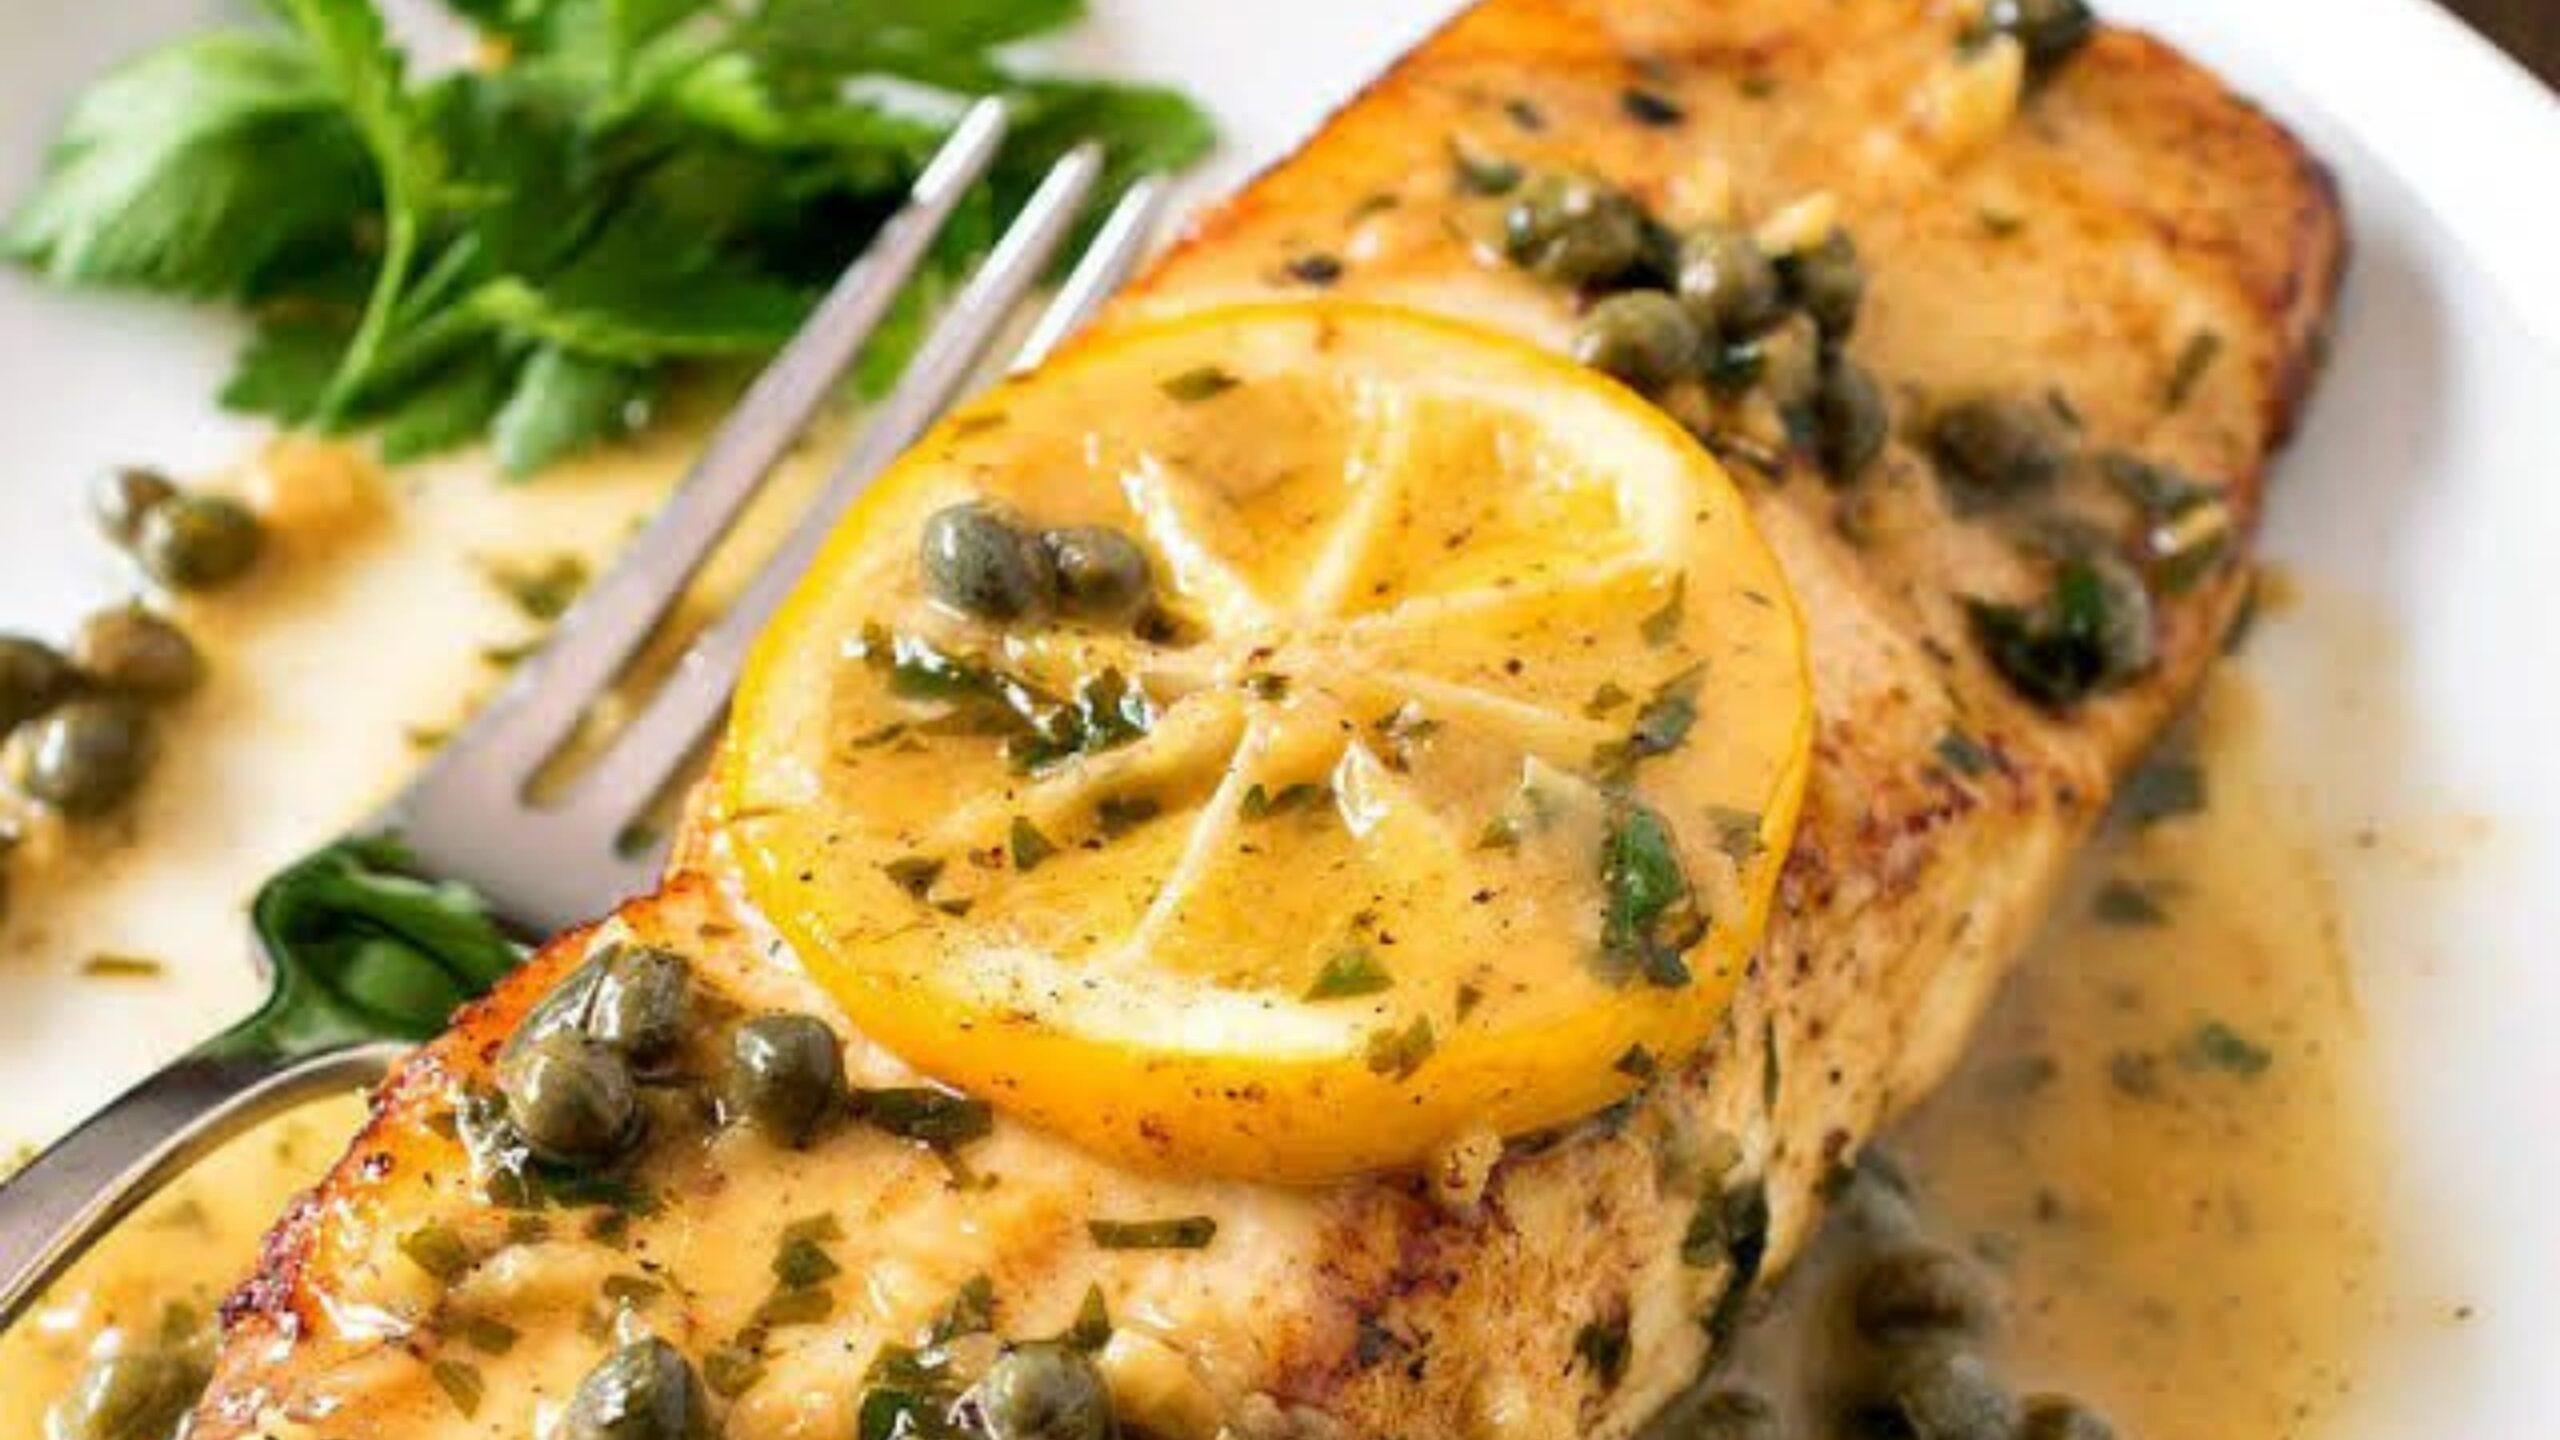 pan-seared halibut recipe image